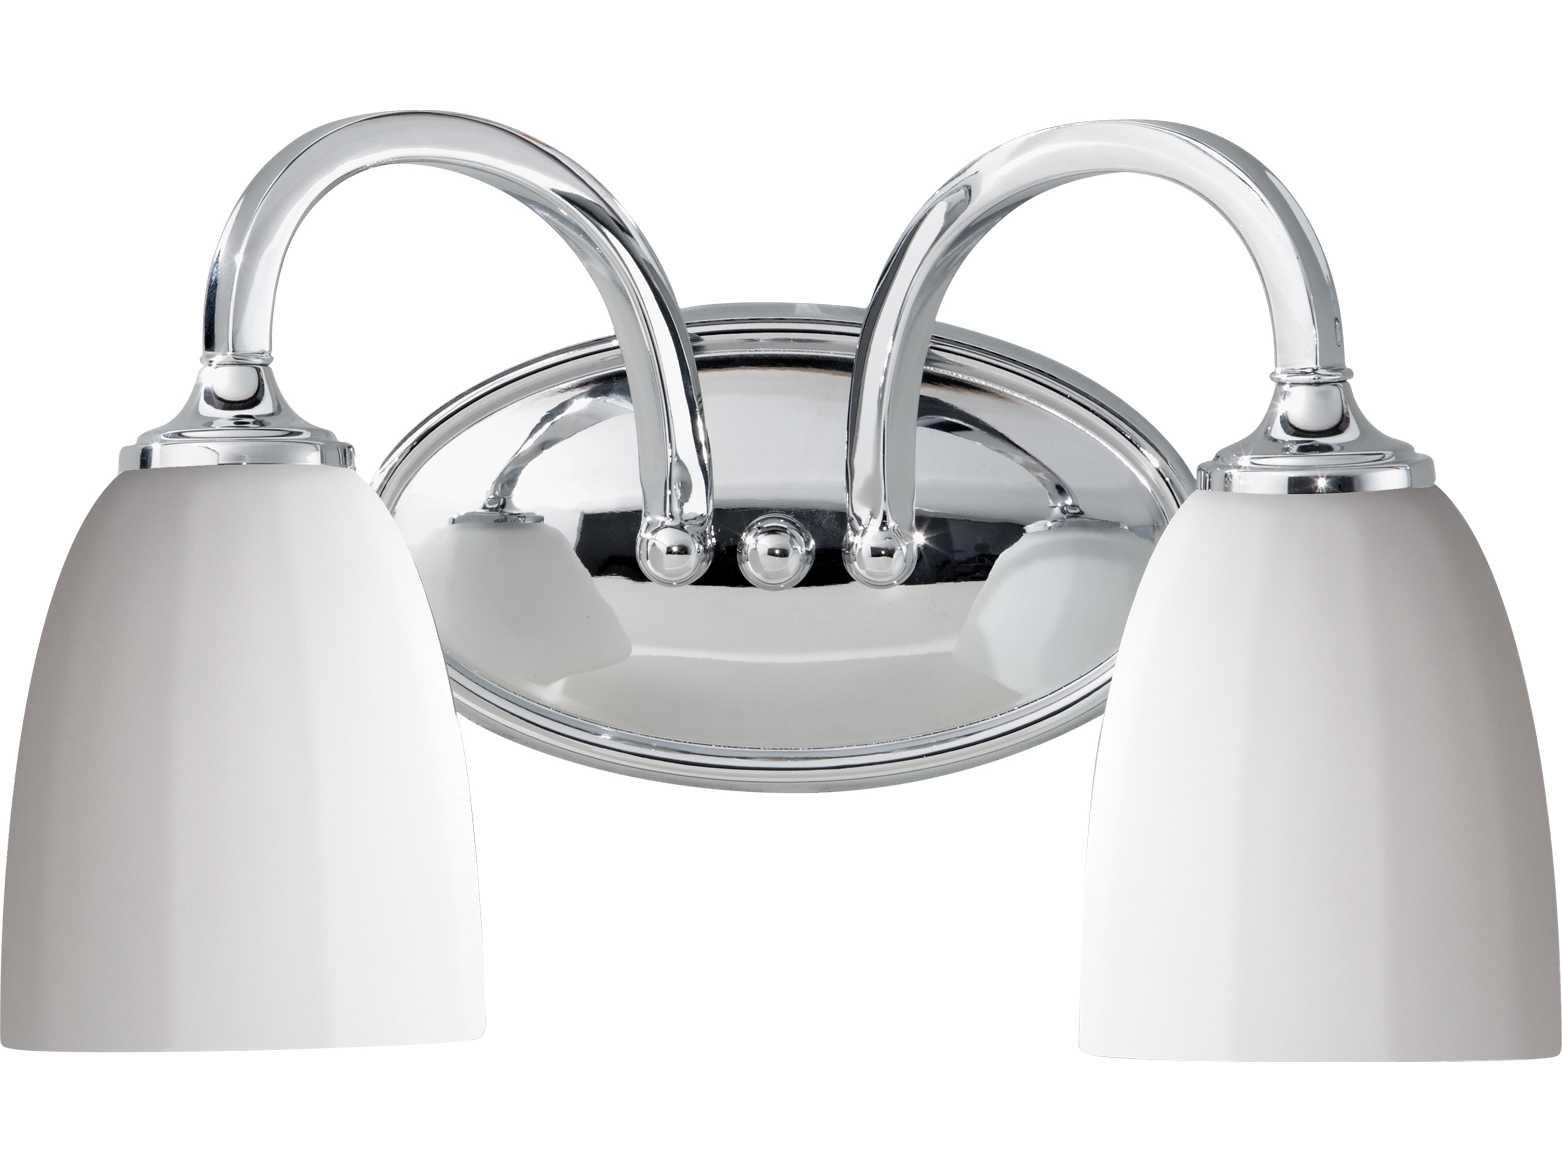 Feiss Perry Chrome Two-Light Vanity Light VS17402-CH